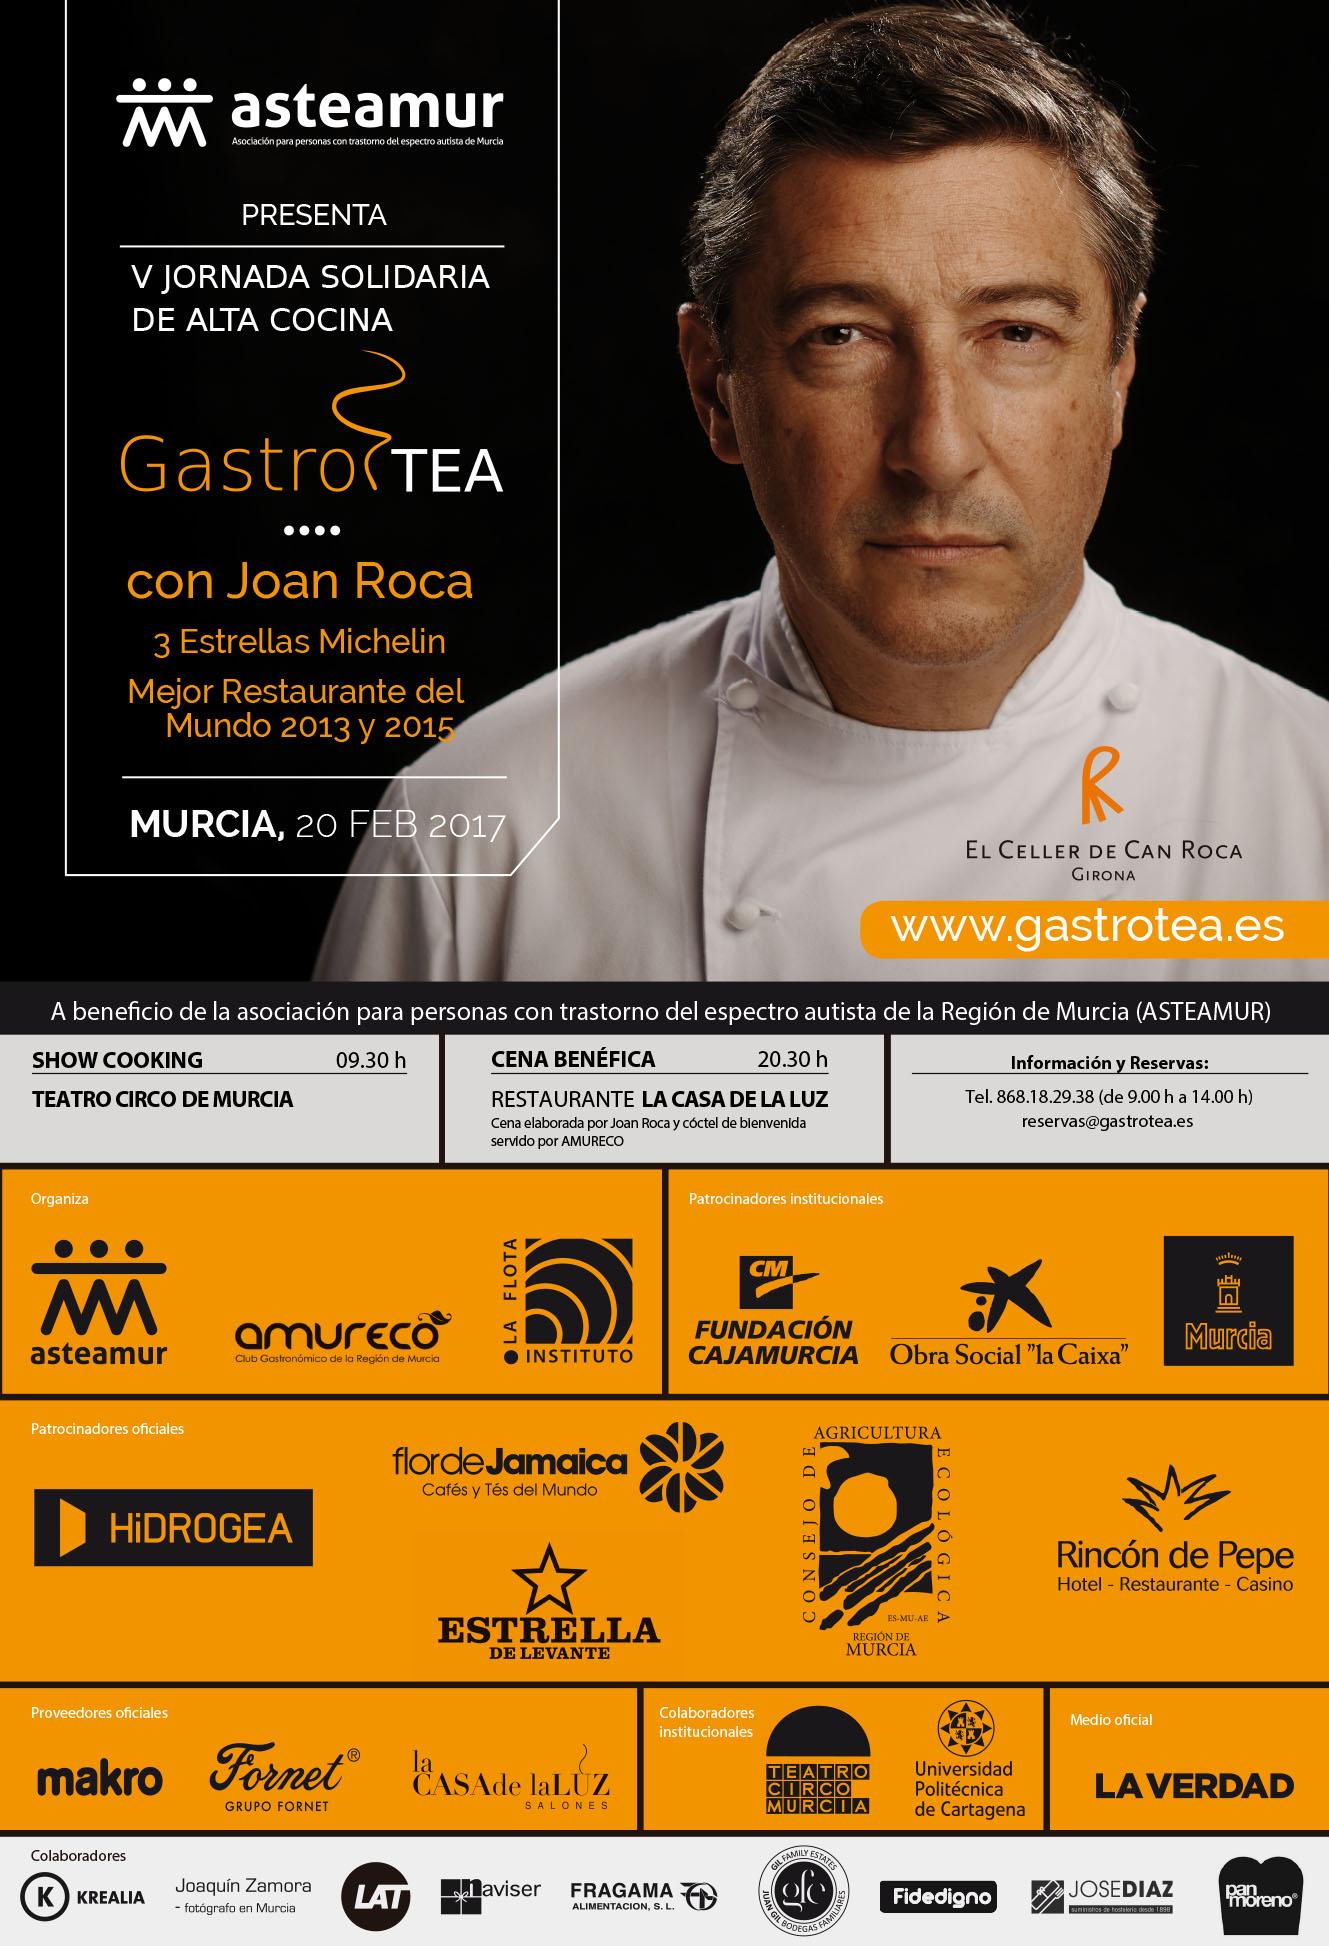 Joan roca cocinar para ni os con autismo for Servicio tecnico roca murcia